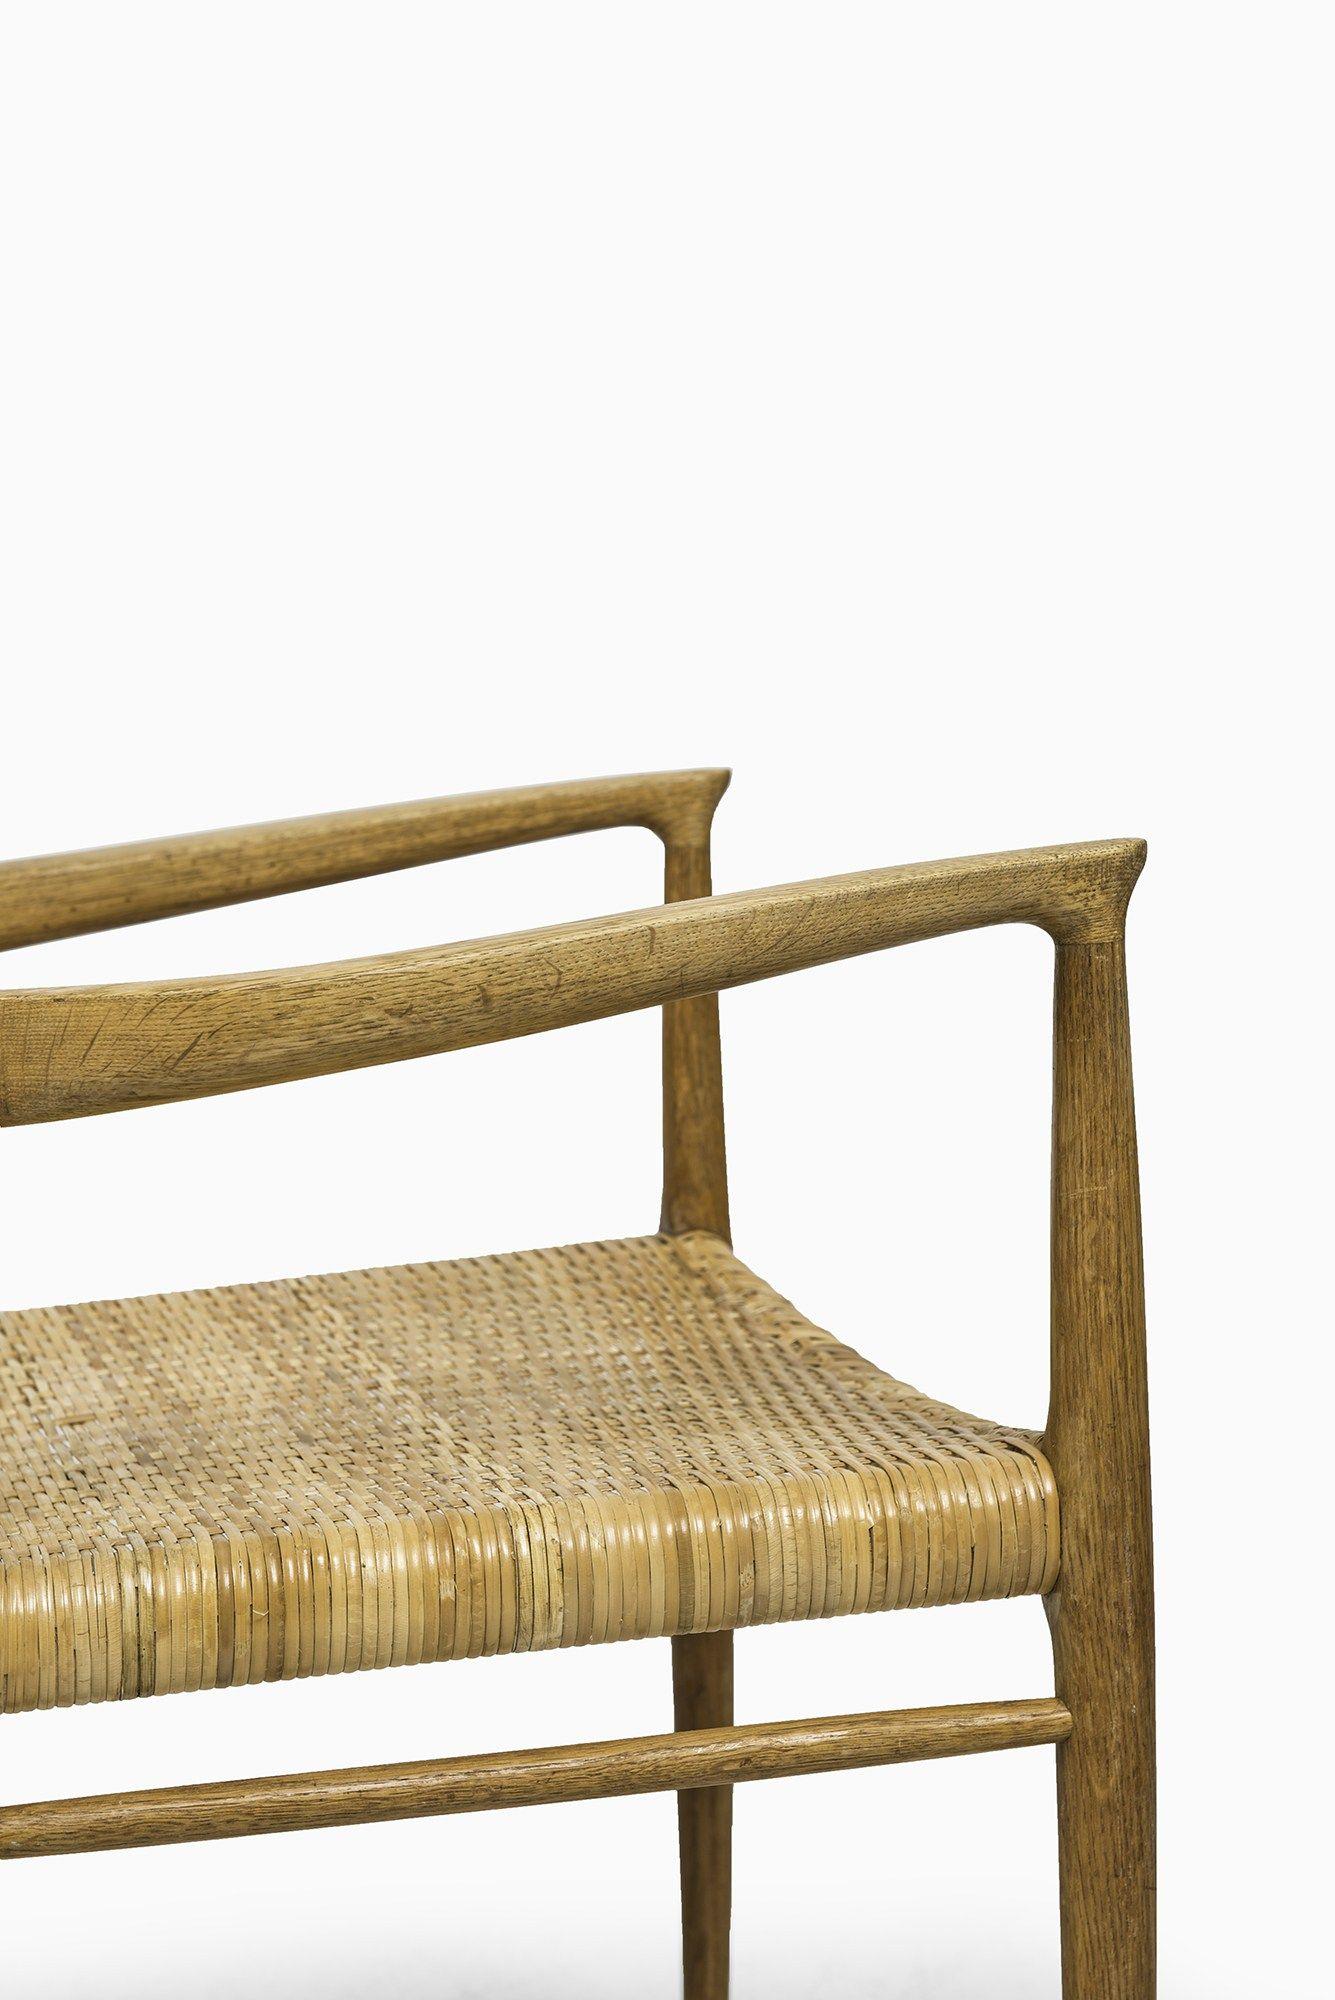 Niels o møller dining chairs model 56 at studio schalling danish modern furniture hans